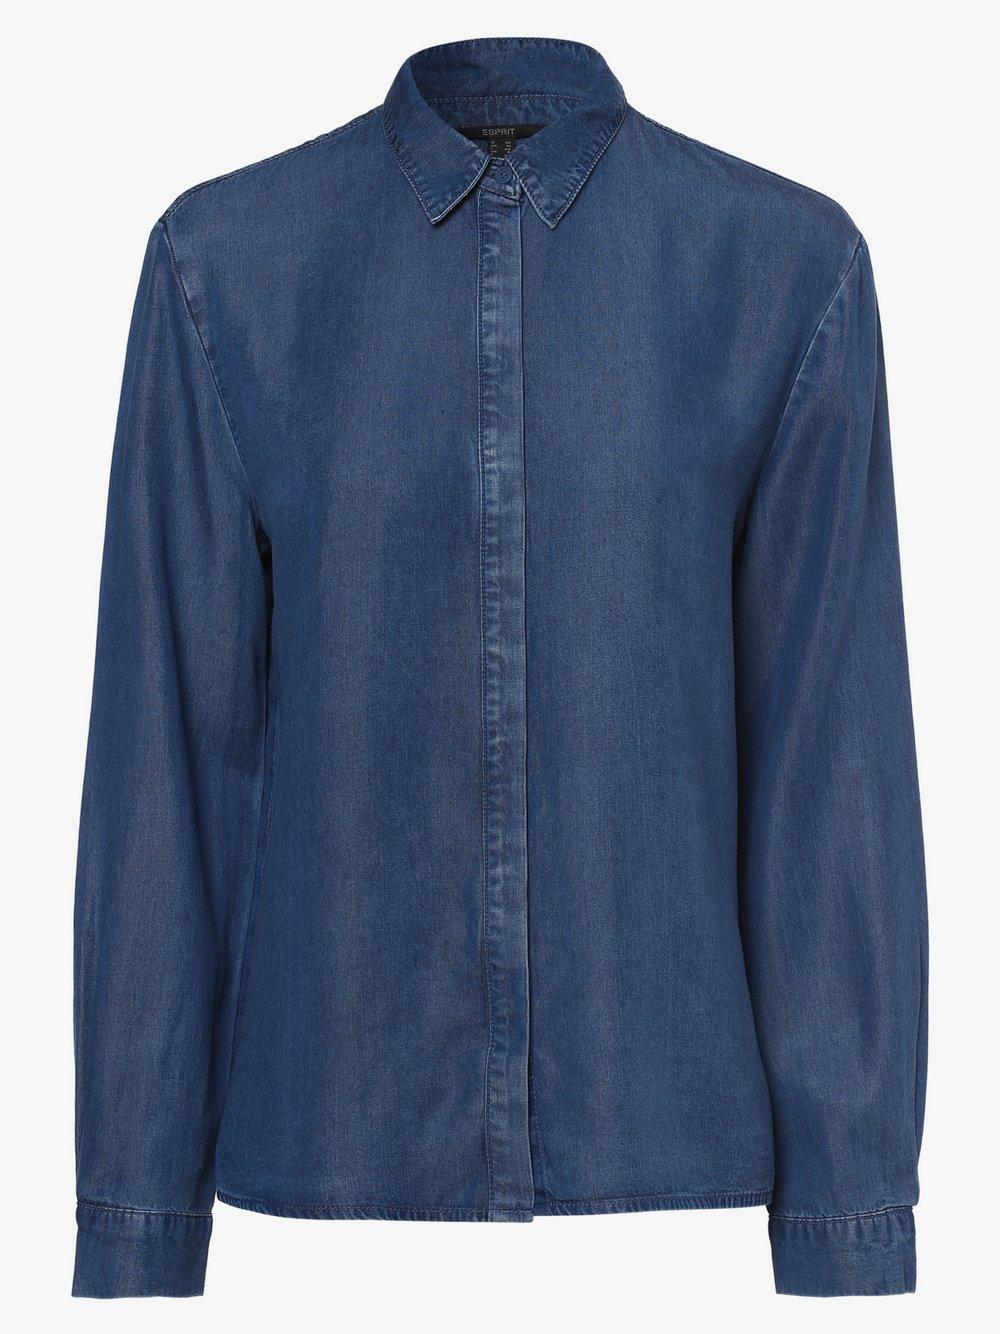 Esprit Collection - Bluzka damska, niebieski